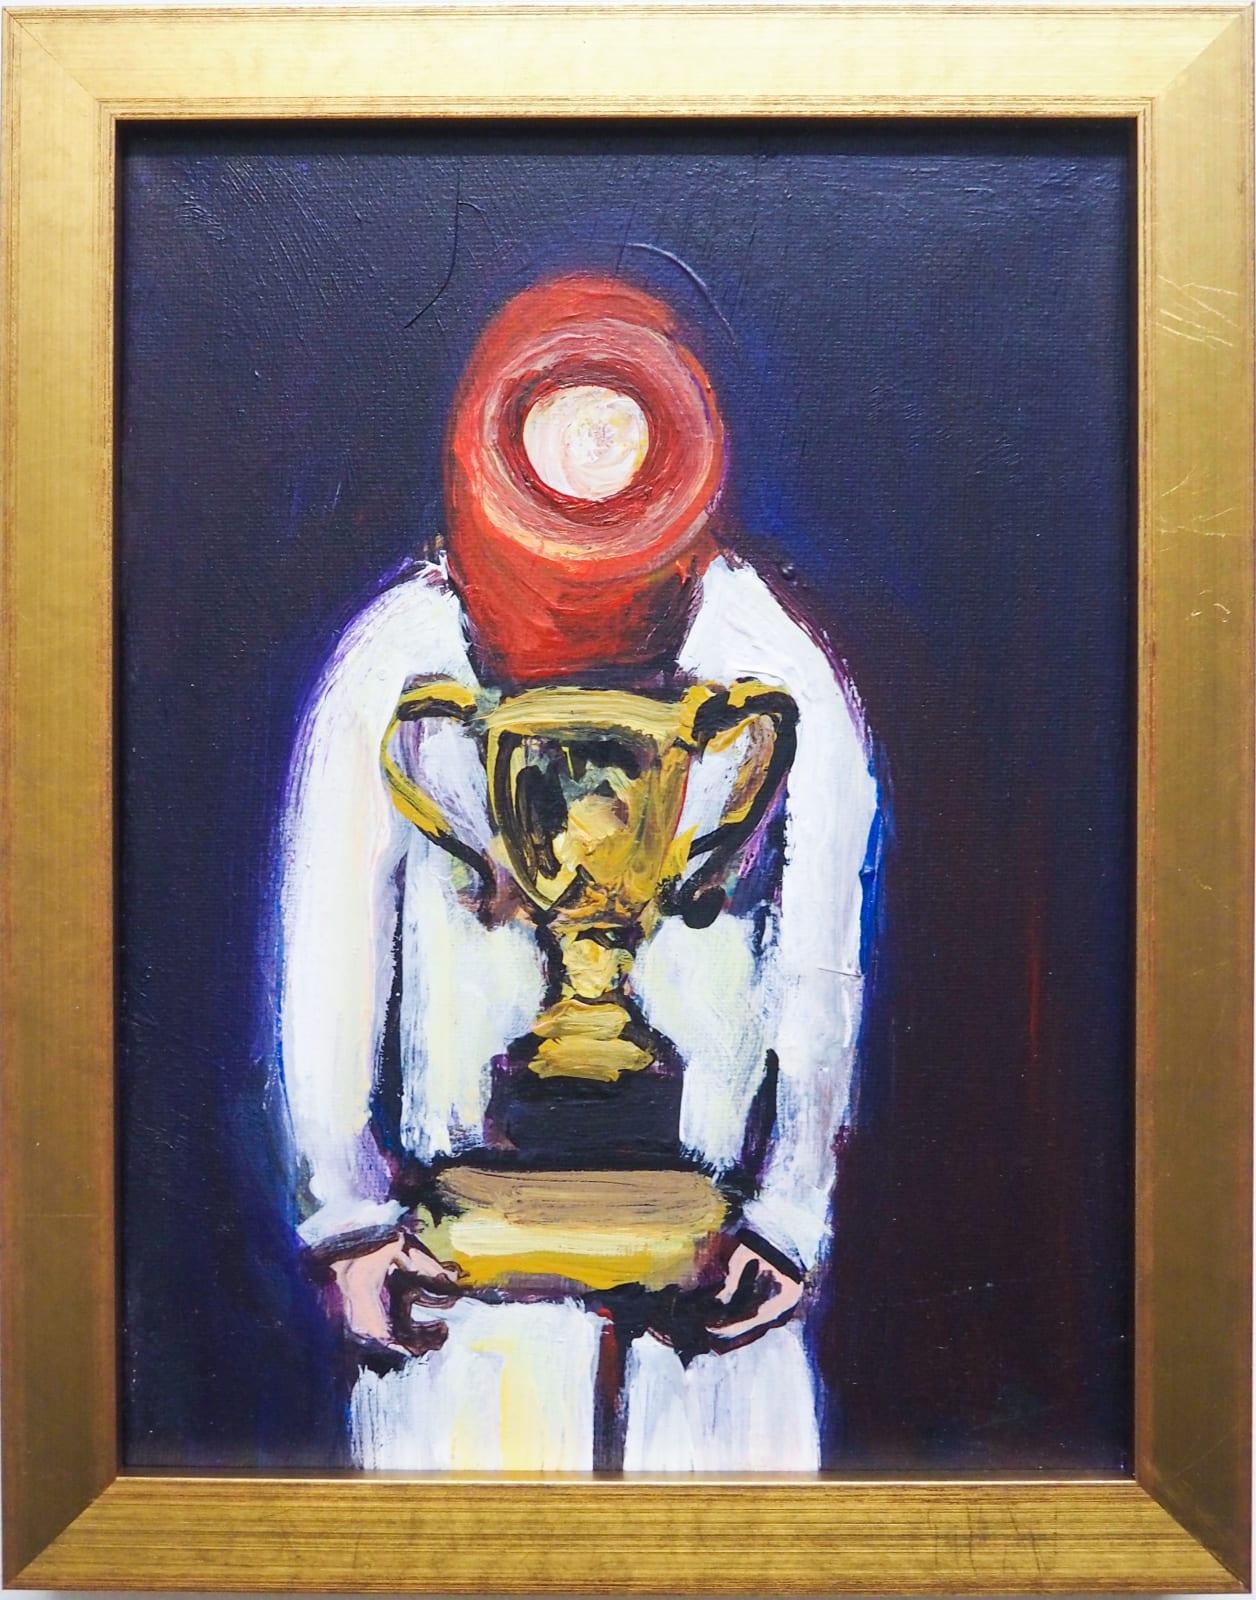 Yassine Balbzioui, easy game 2, 2018 Oil on canvas 22.5 x 17.5 cm (framed)